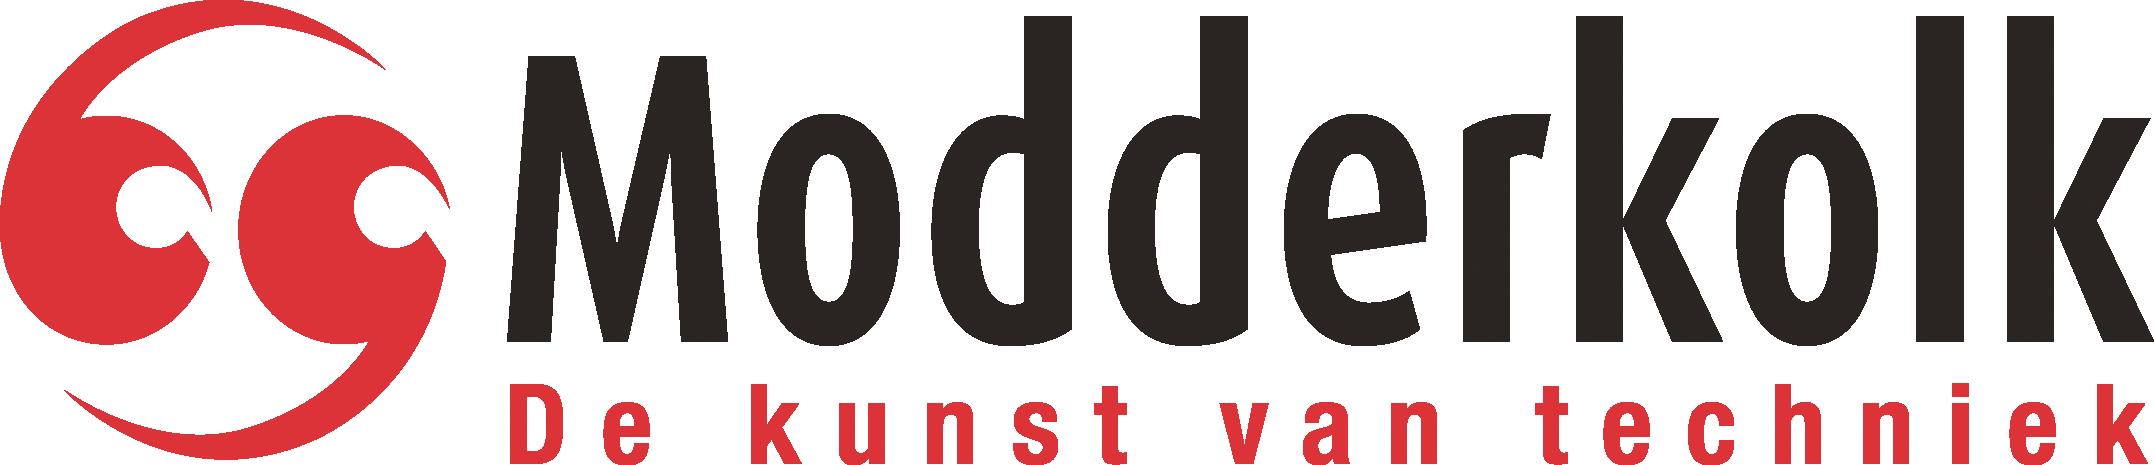 modderkolk logo